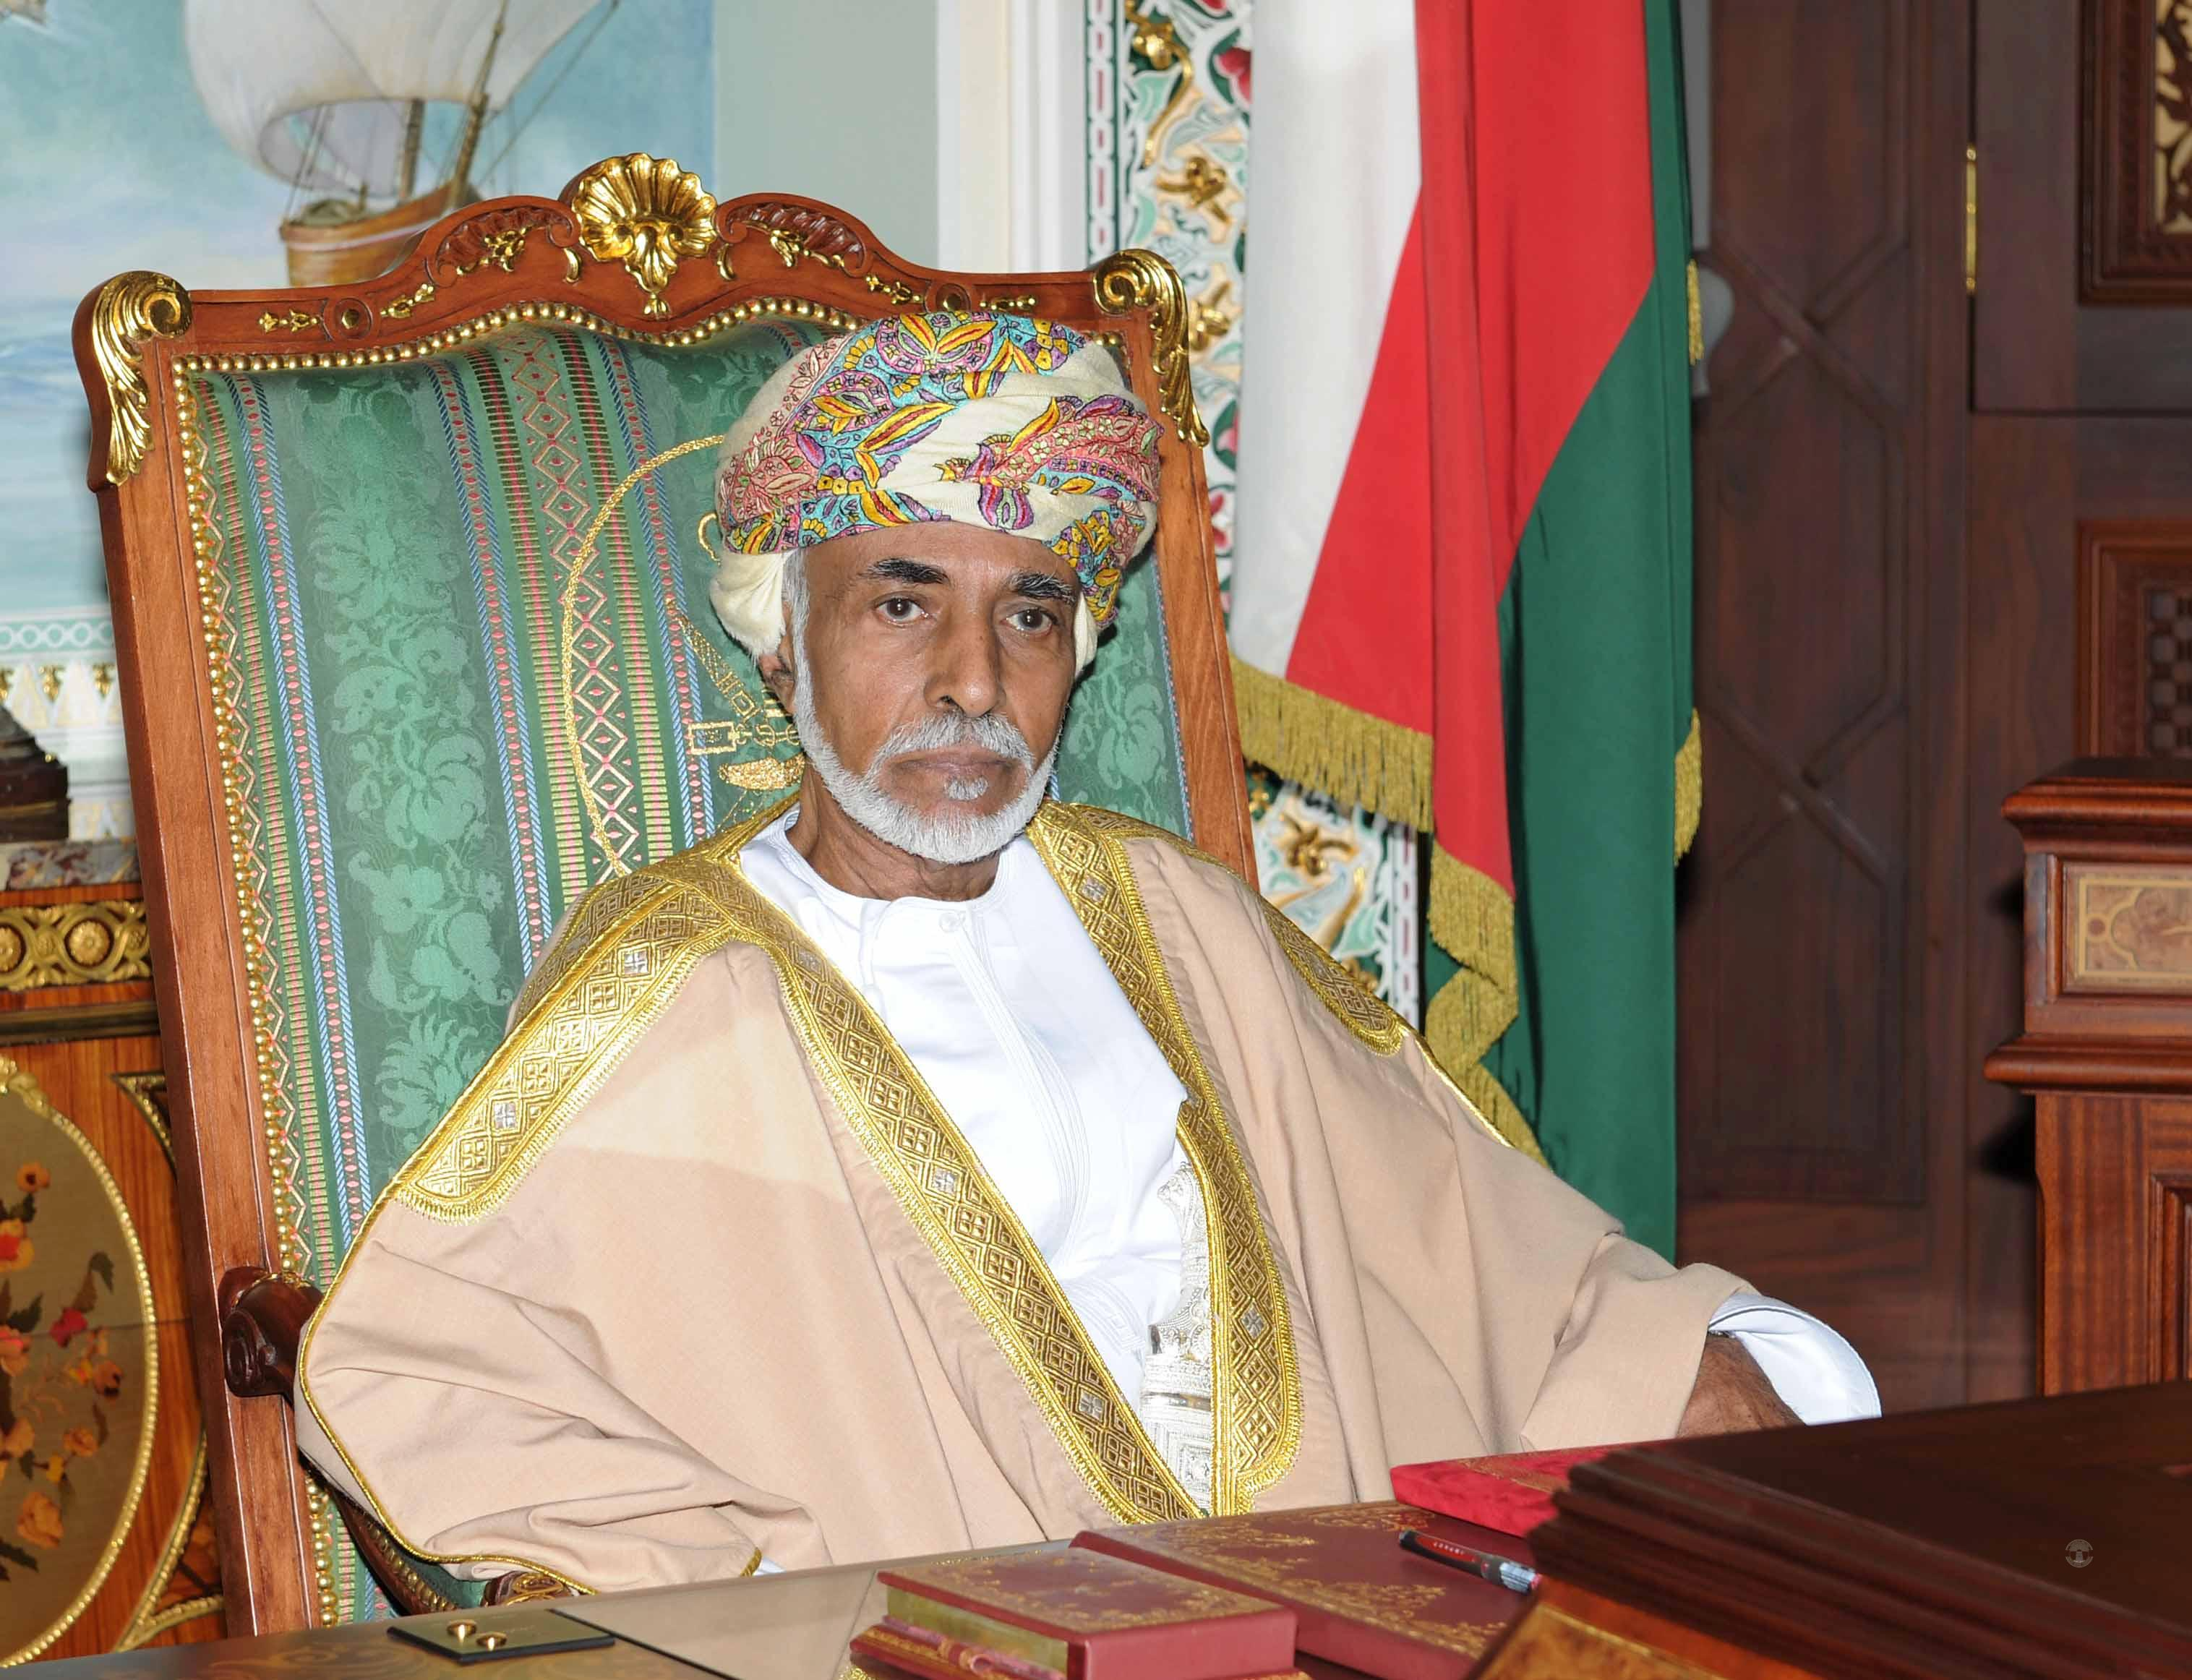 His Majesty Sultan Qaboos sends condolences to Saudi Arabia, Russia